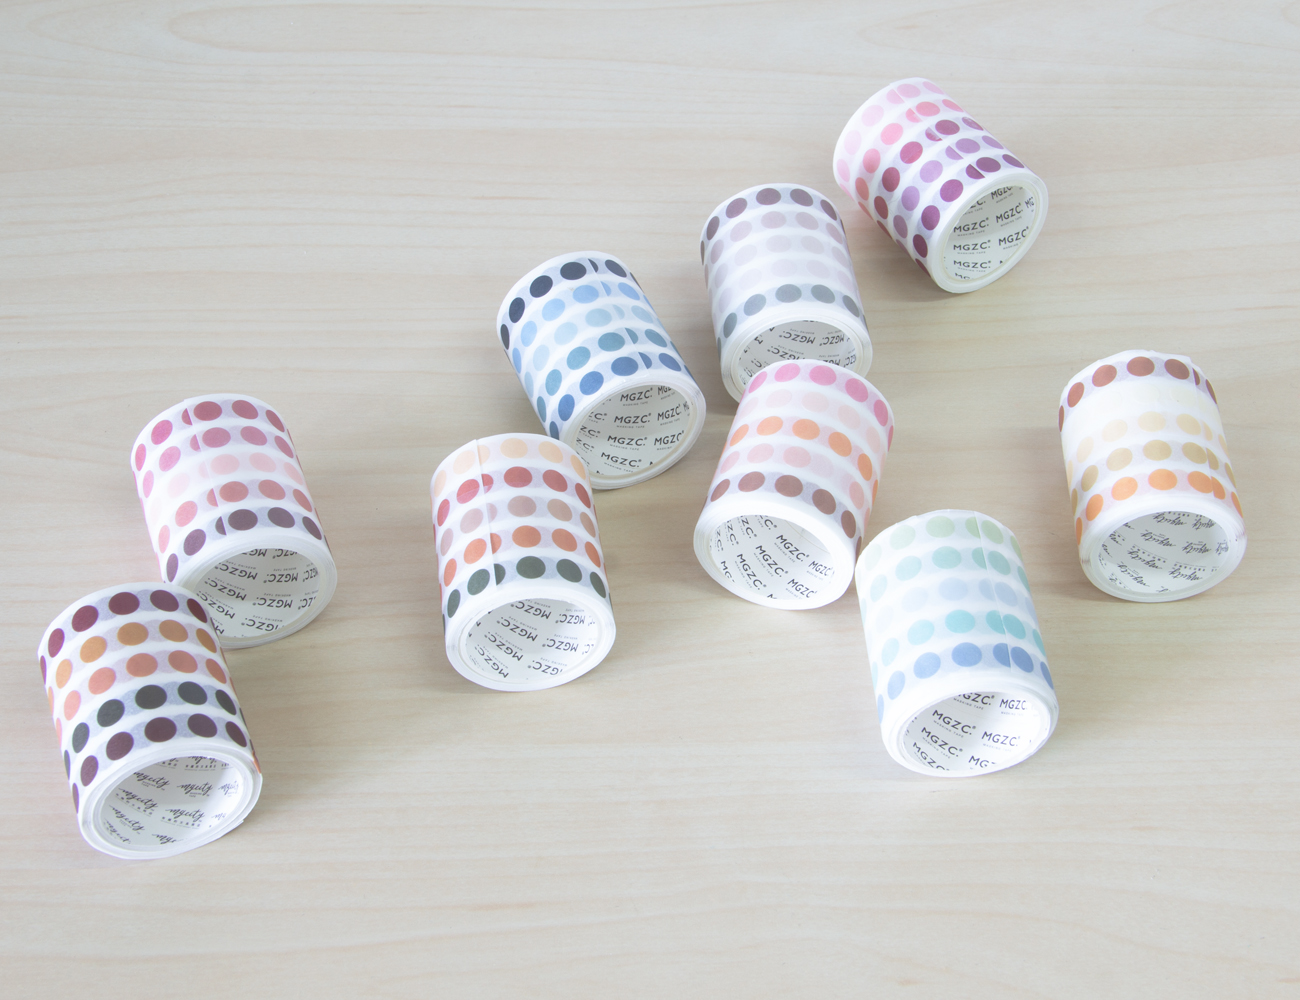 Mini Dot Matte Sticker Roll (6 mm)